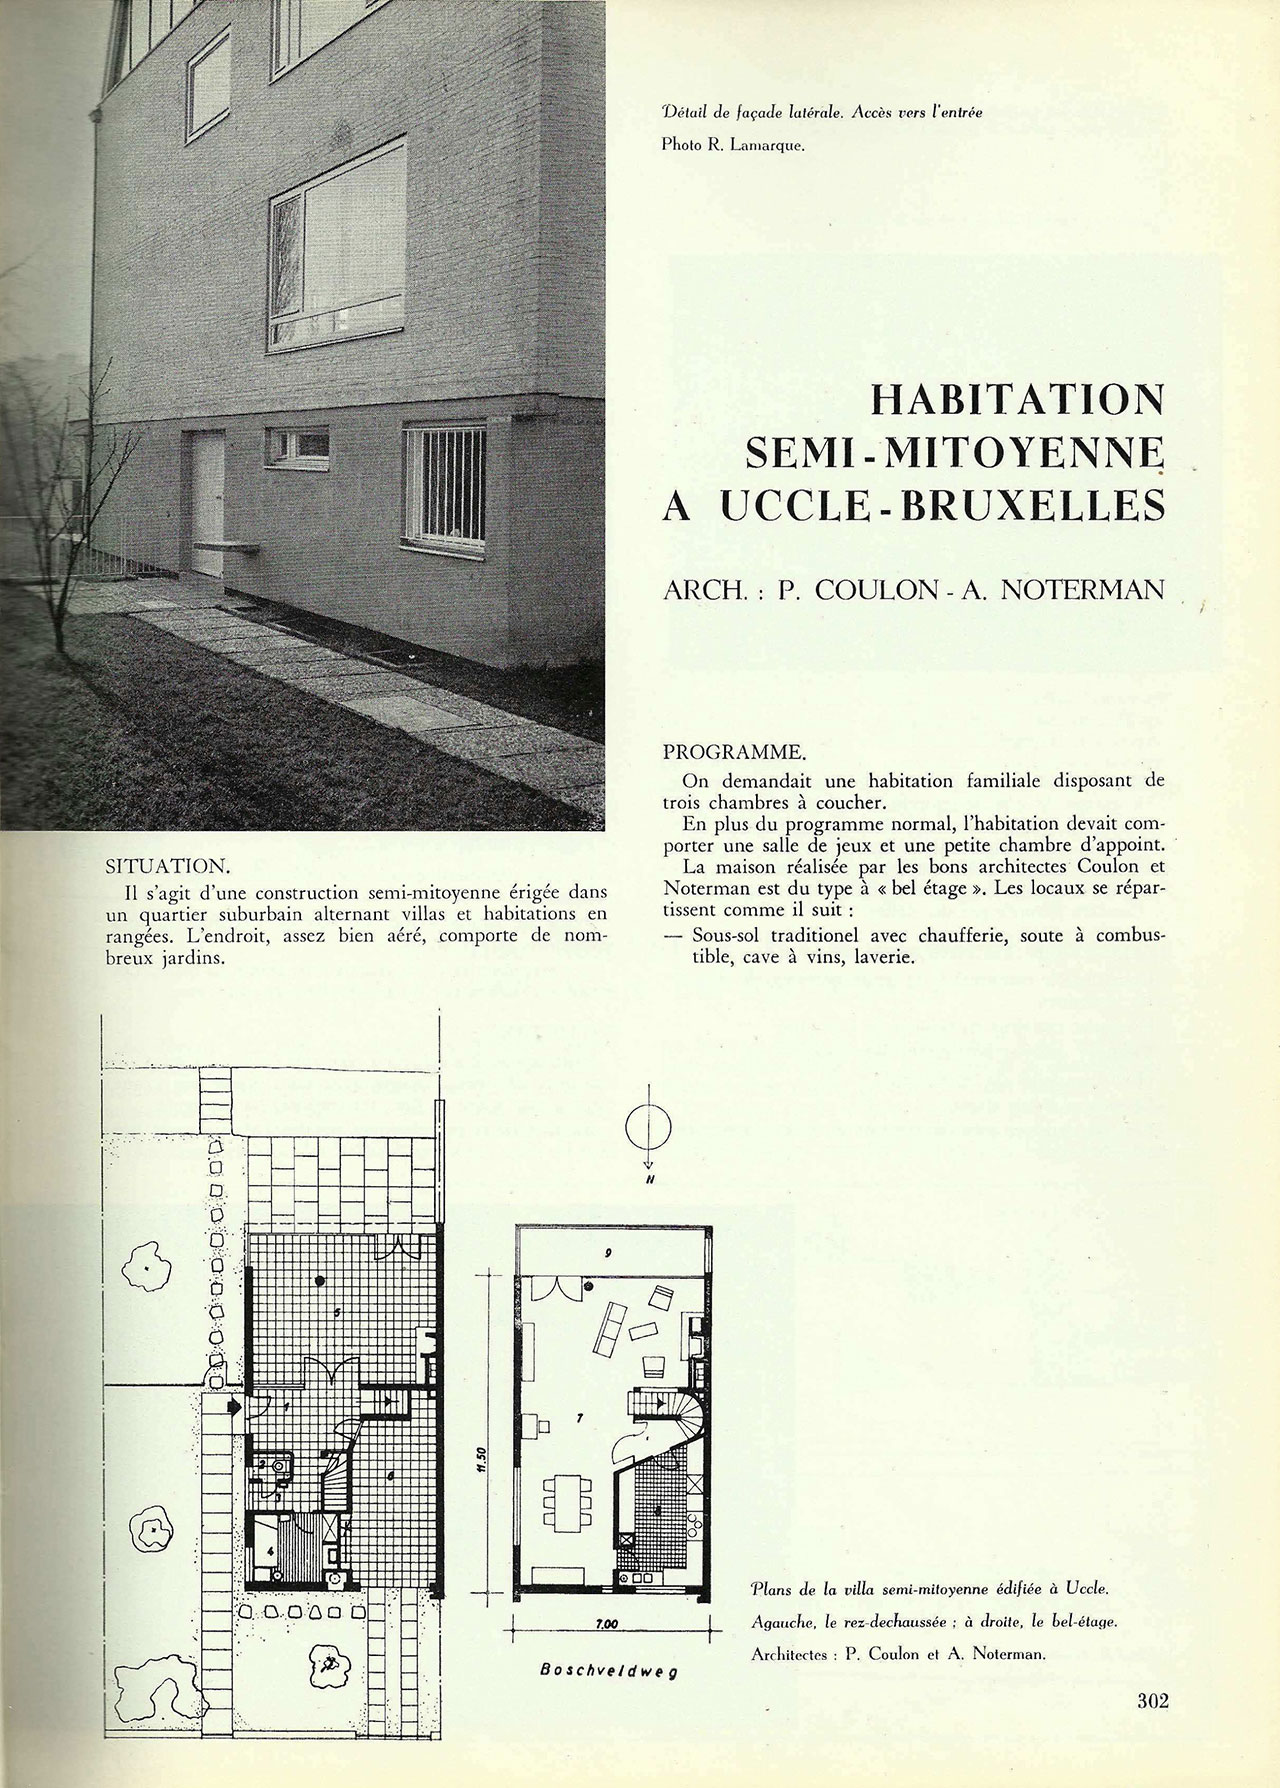 Habitation semi-mitoyenne à Uccle-Bruxelles